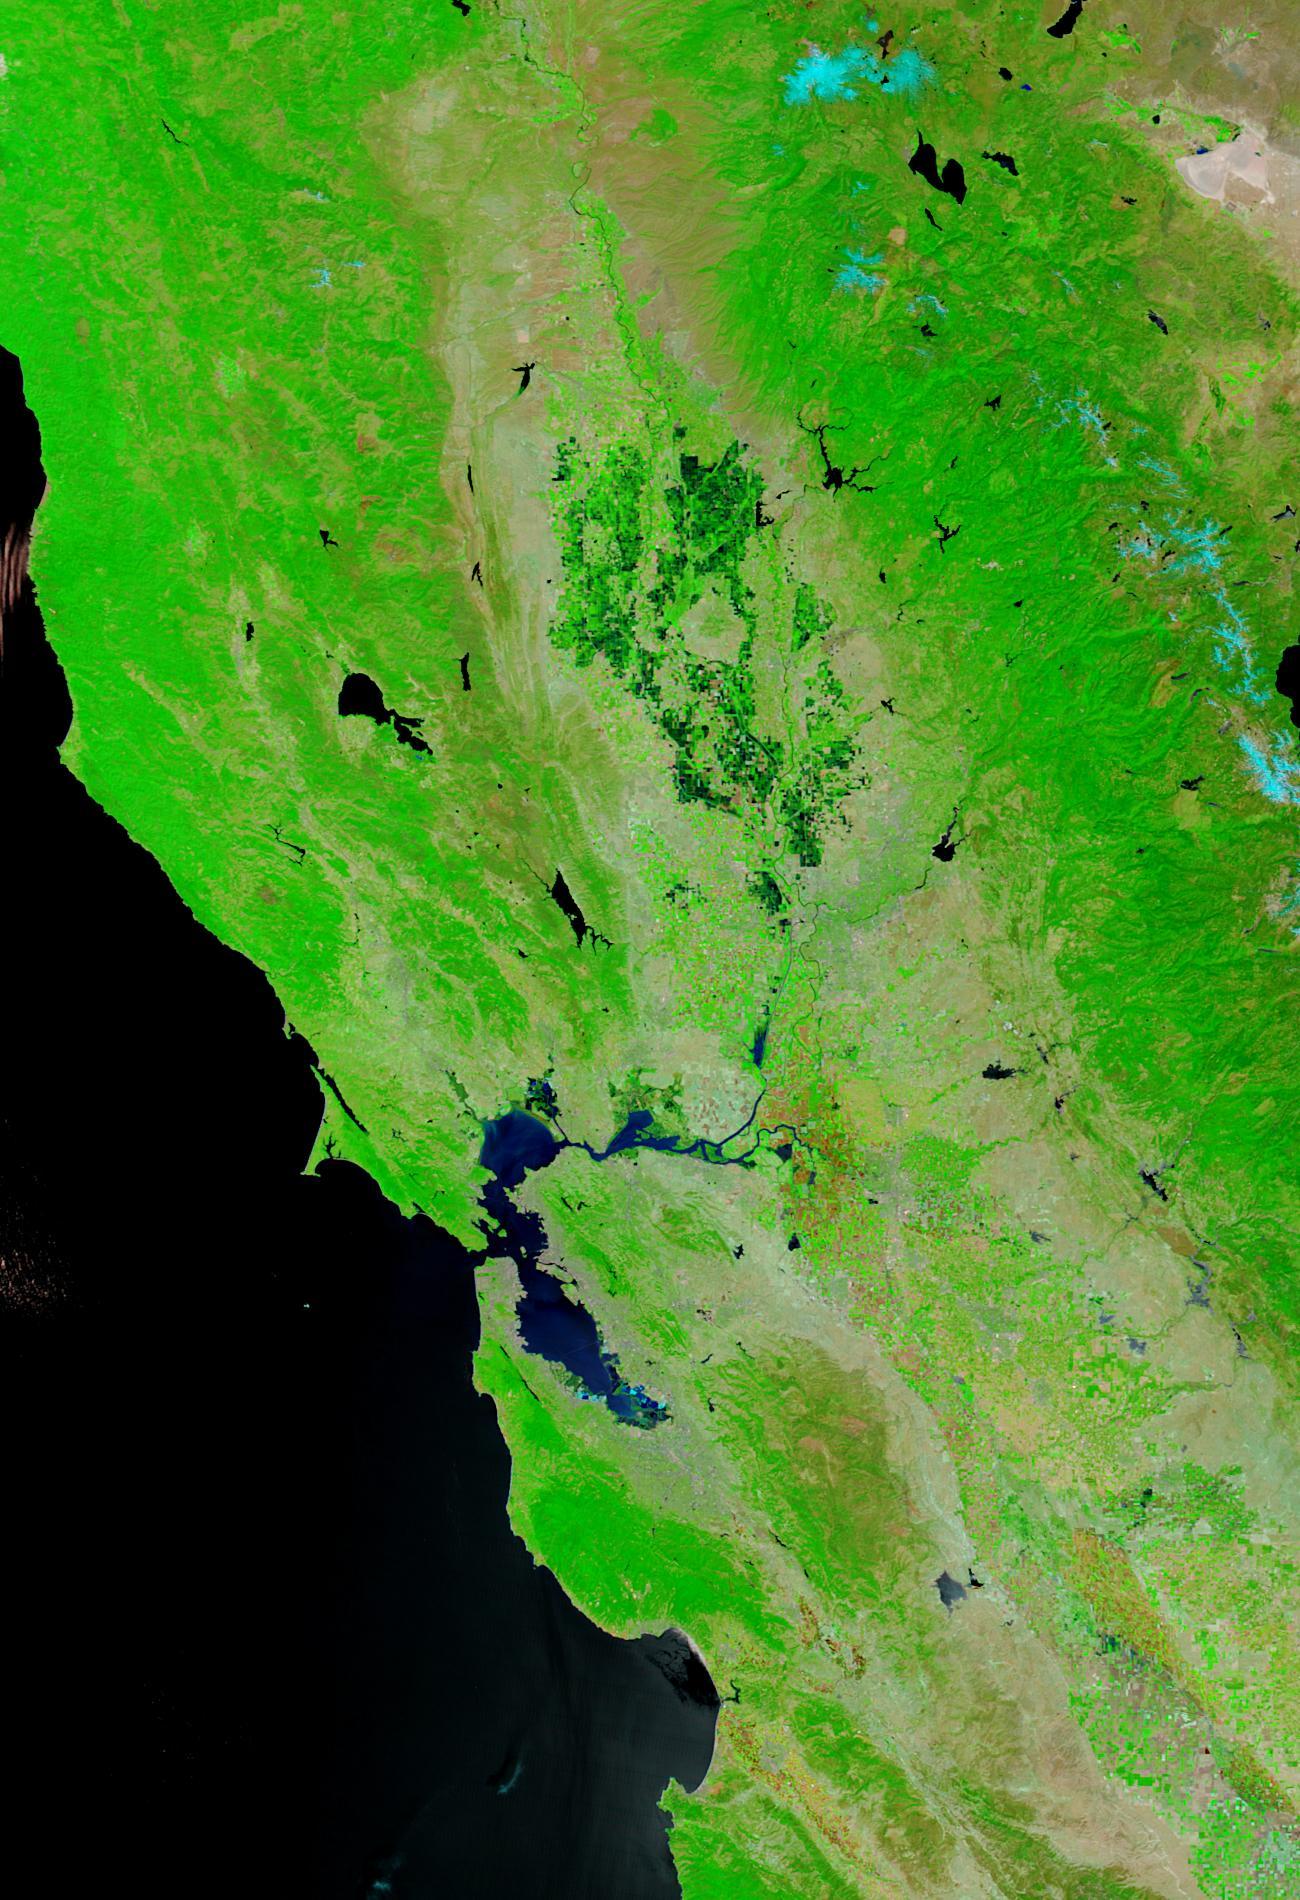 San Joaquin-Sacramento River Delta, California (before levee break, false color)